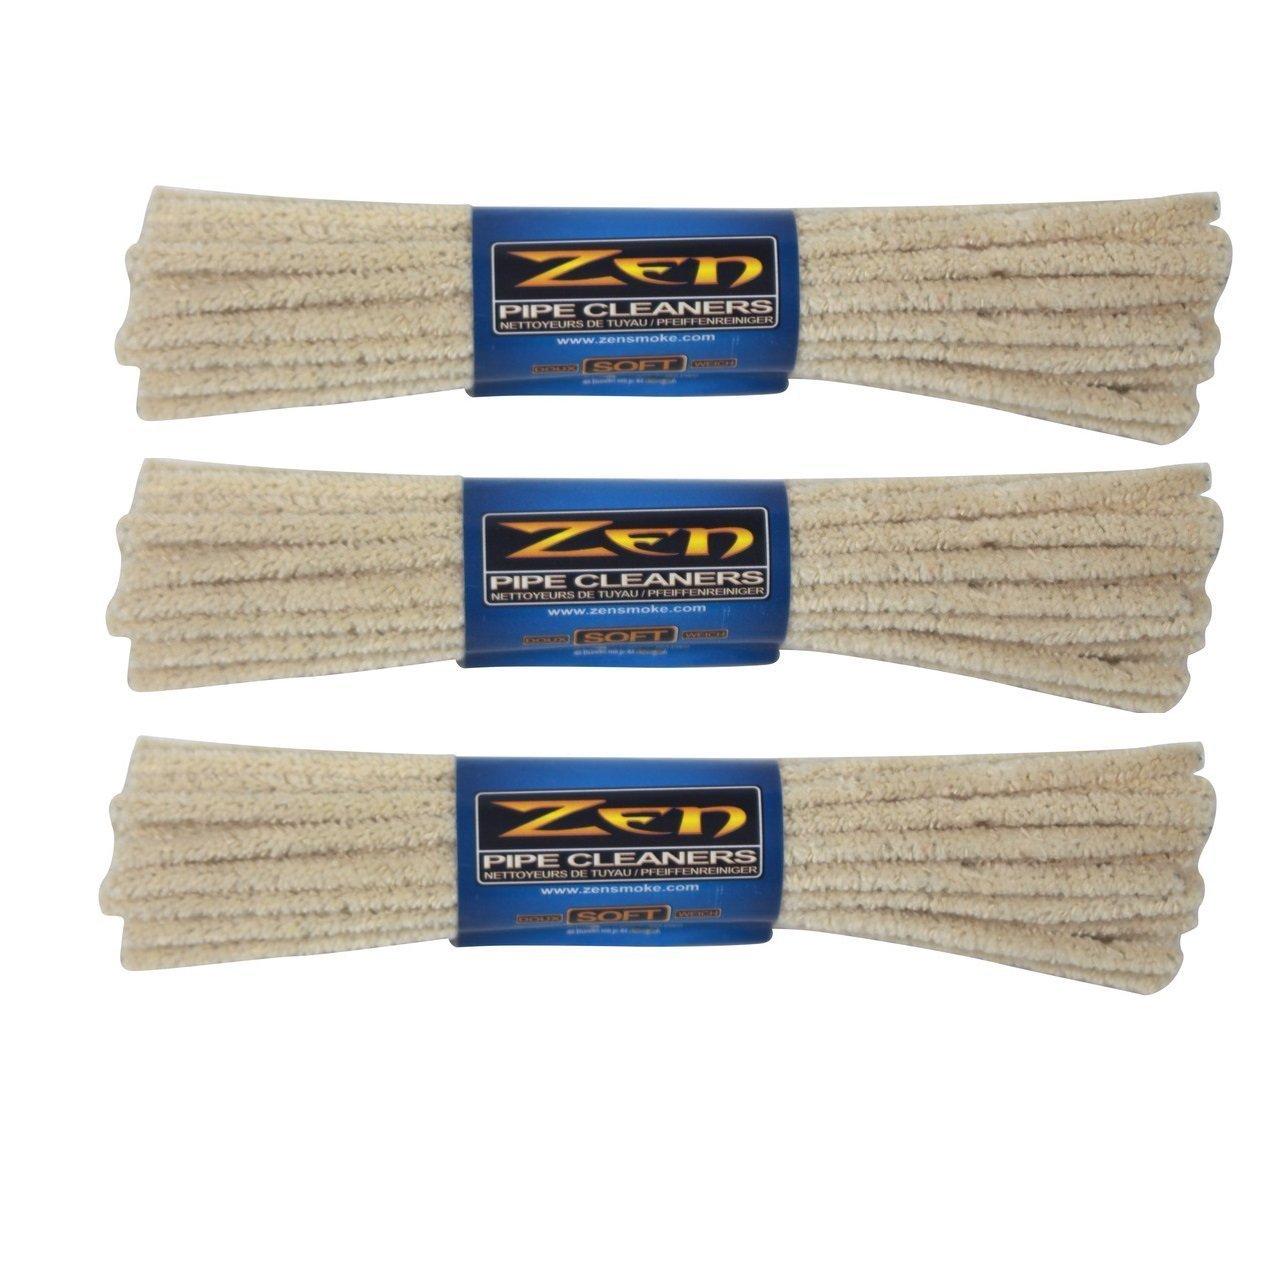 Amazon.com: Zen 3 Bundles Pipe Cleaners, Soft, 132 Count: Home ...